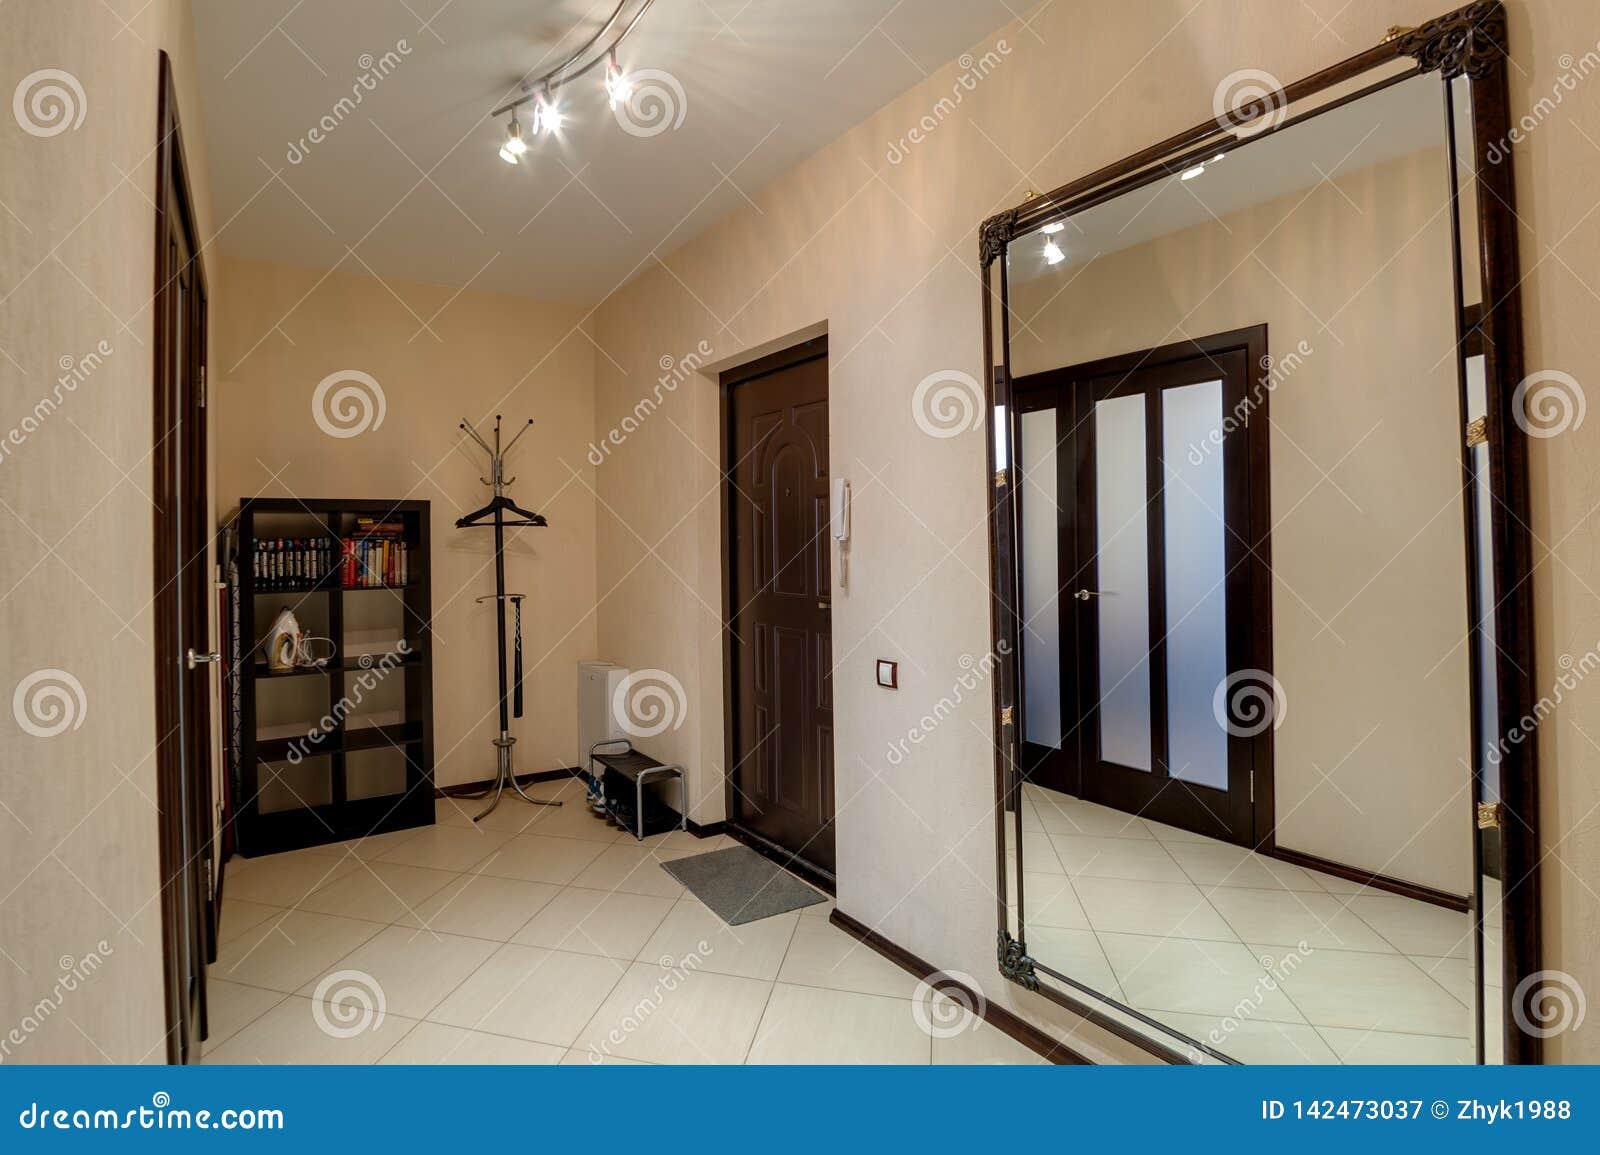 Russia, Novosibirsk - 24 February, 2016: interior room apartment